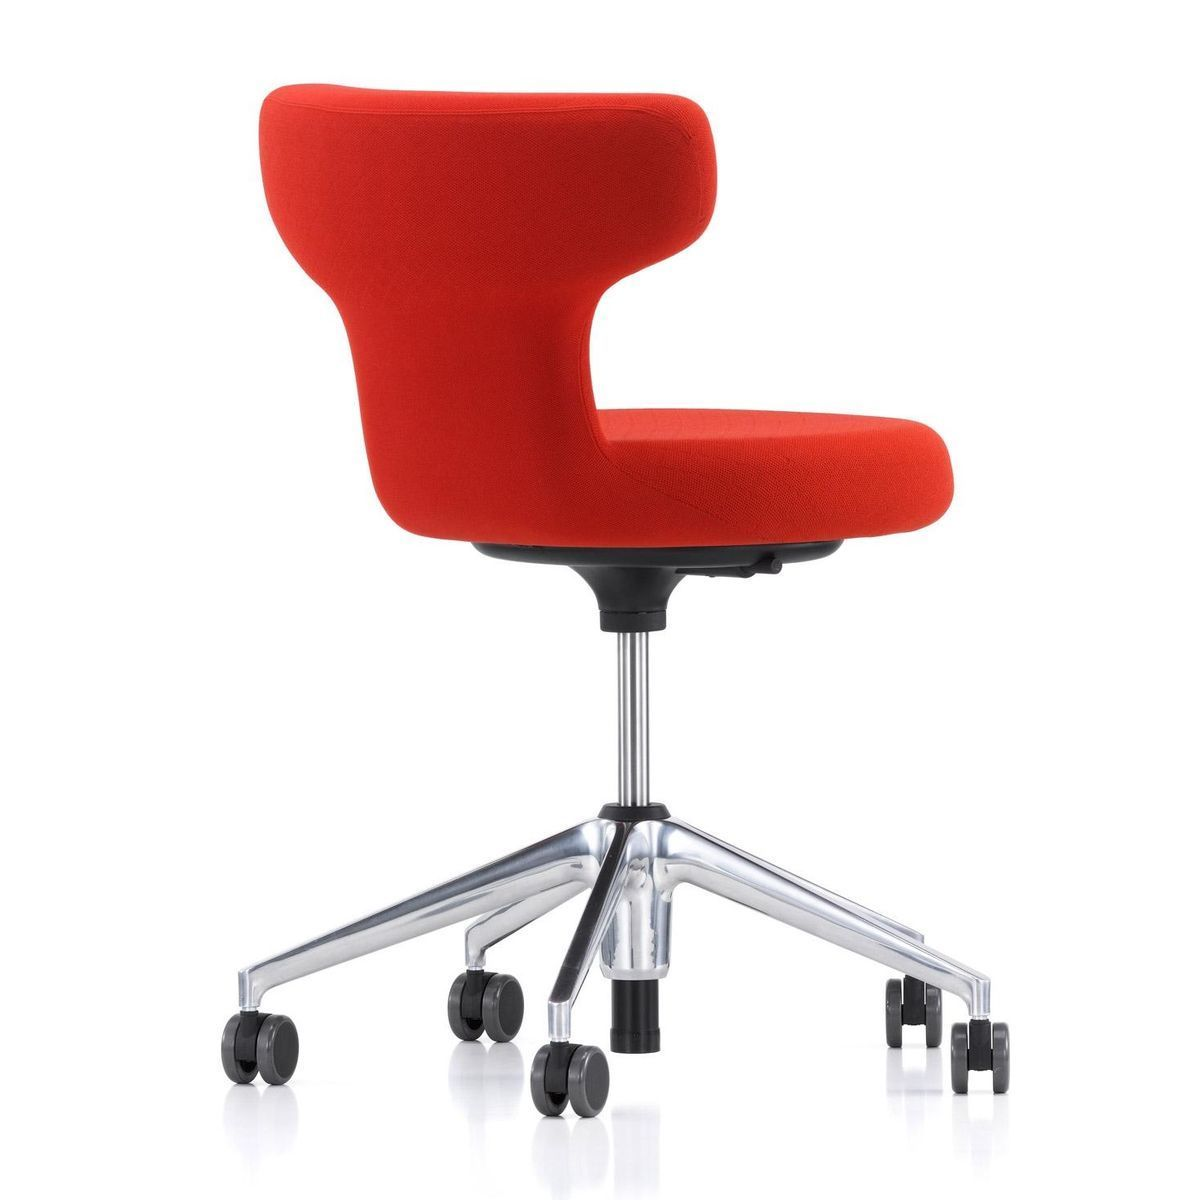 Vitra pivot citterio chaise de bureau vitra for Chaise de bureau vitra prix